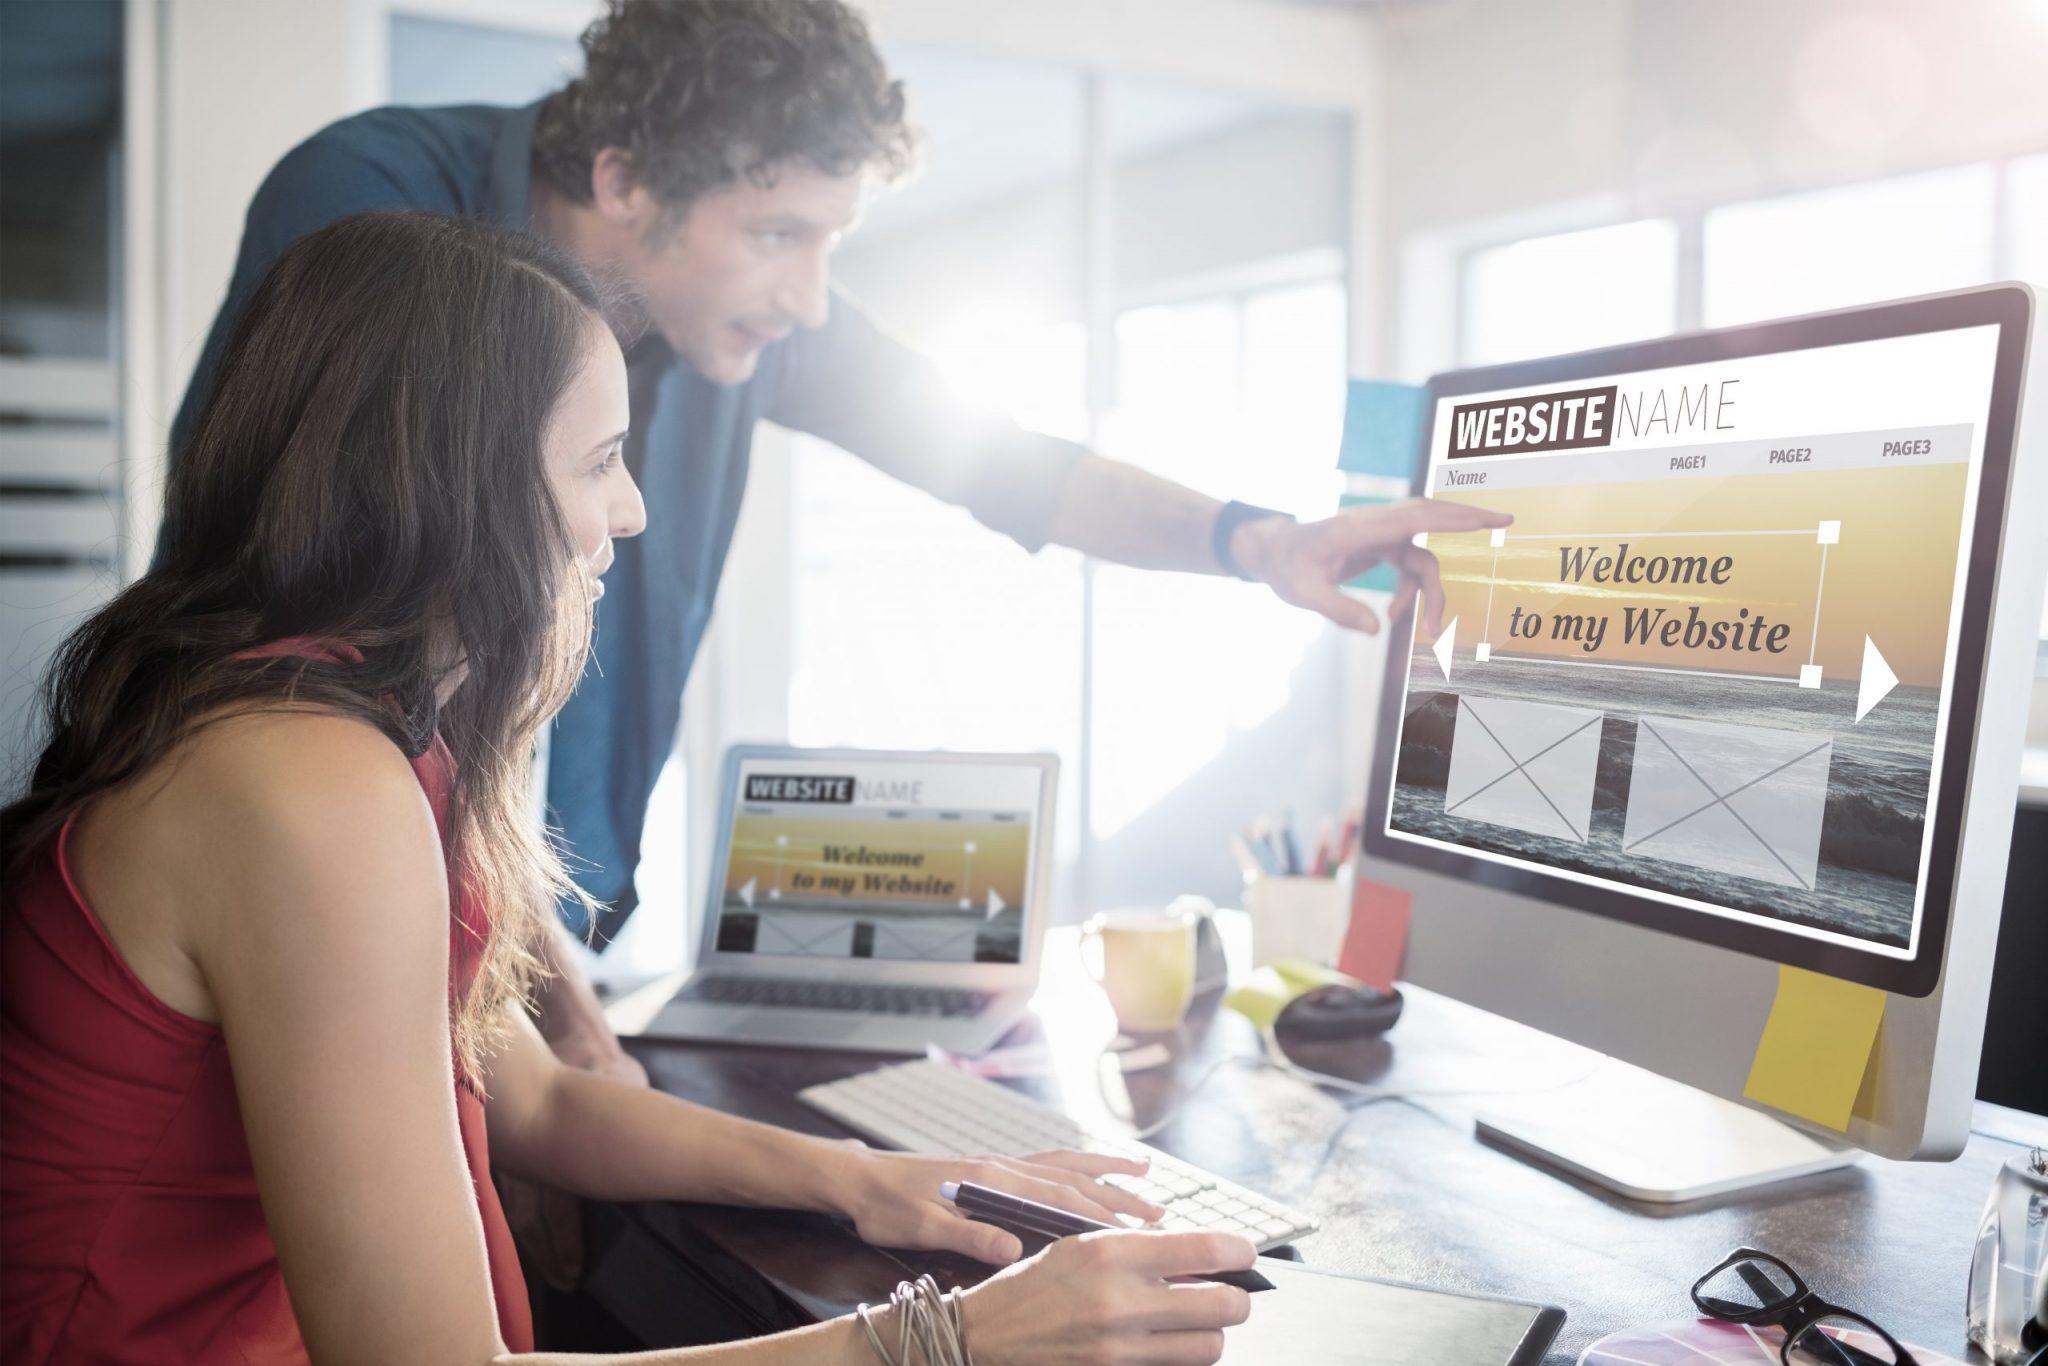 Man helping woman design her website